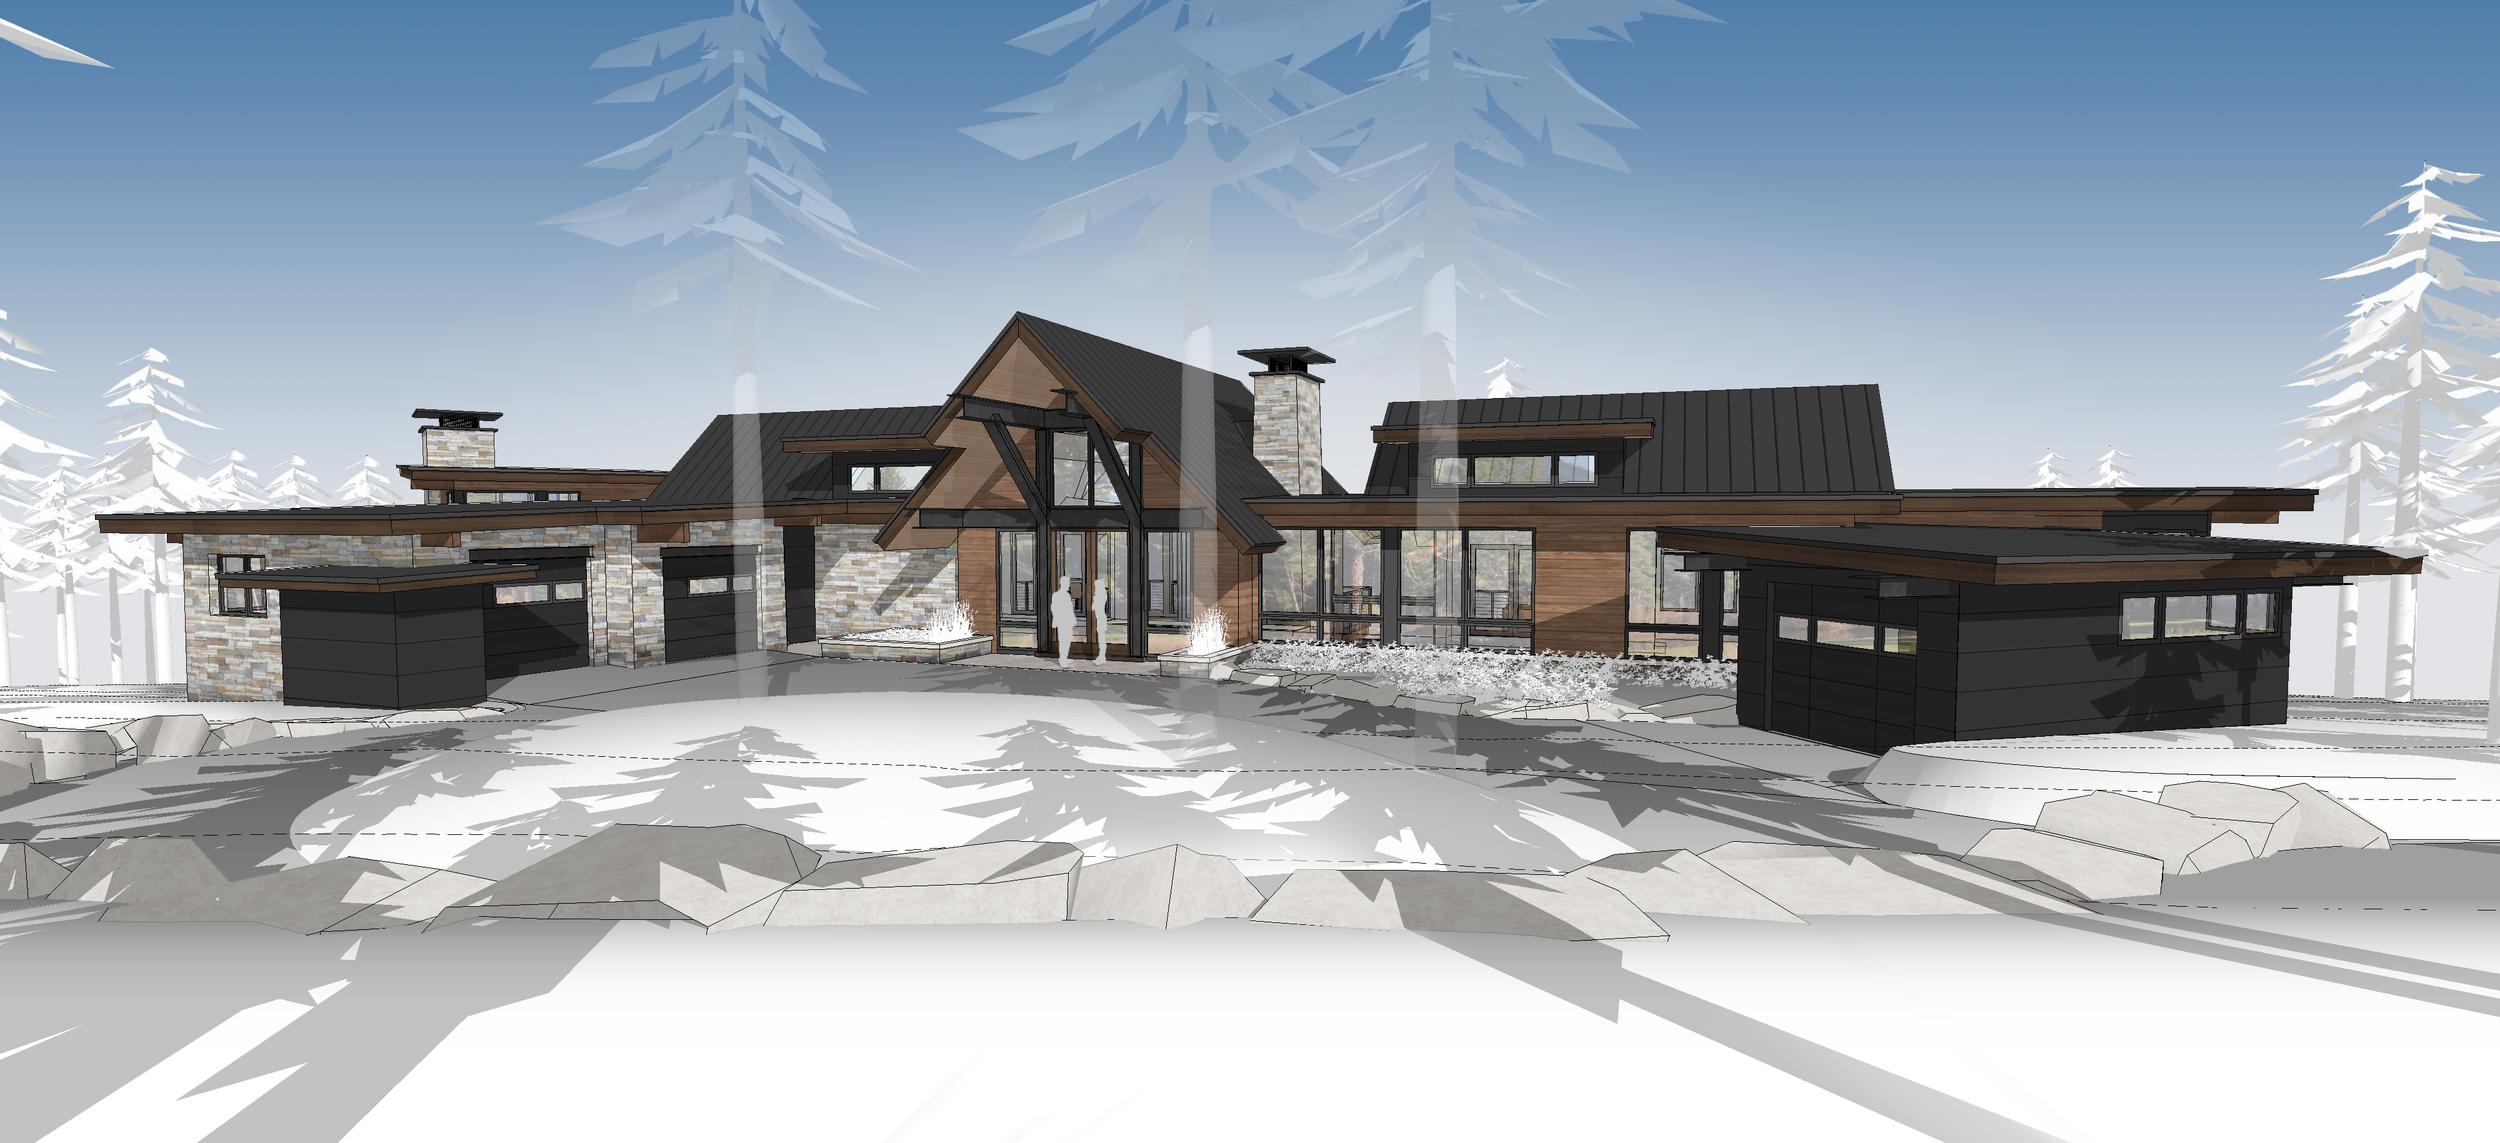 Contractor: Heslin Construction   Square Footage: 5,166 sf bedrooms: 4 bathrooms: 4.5